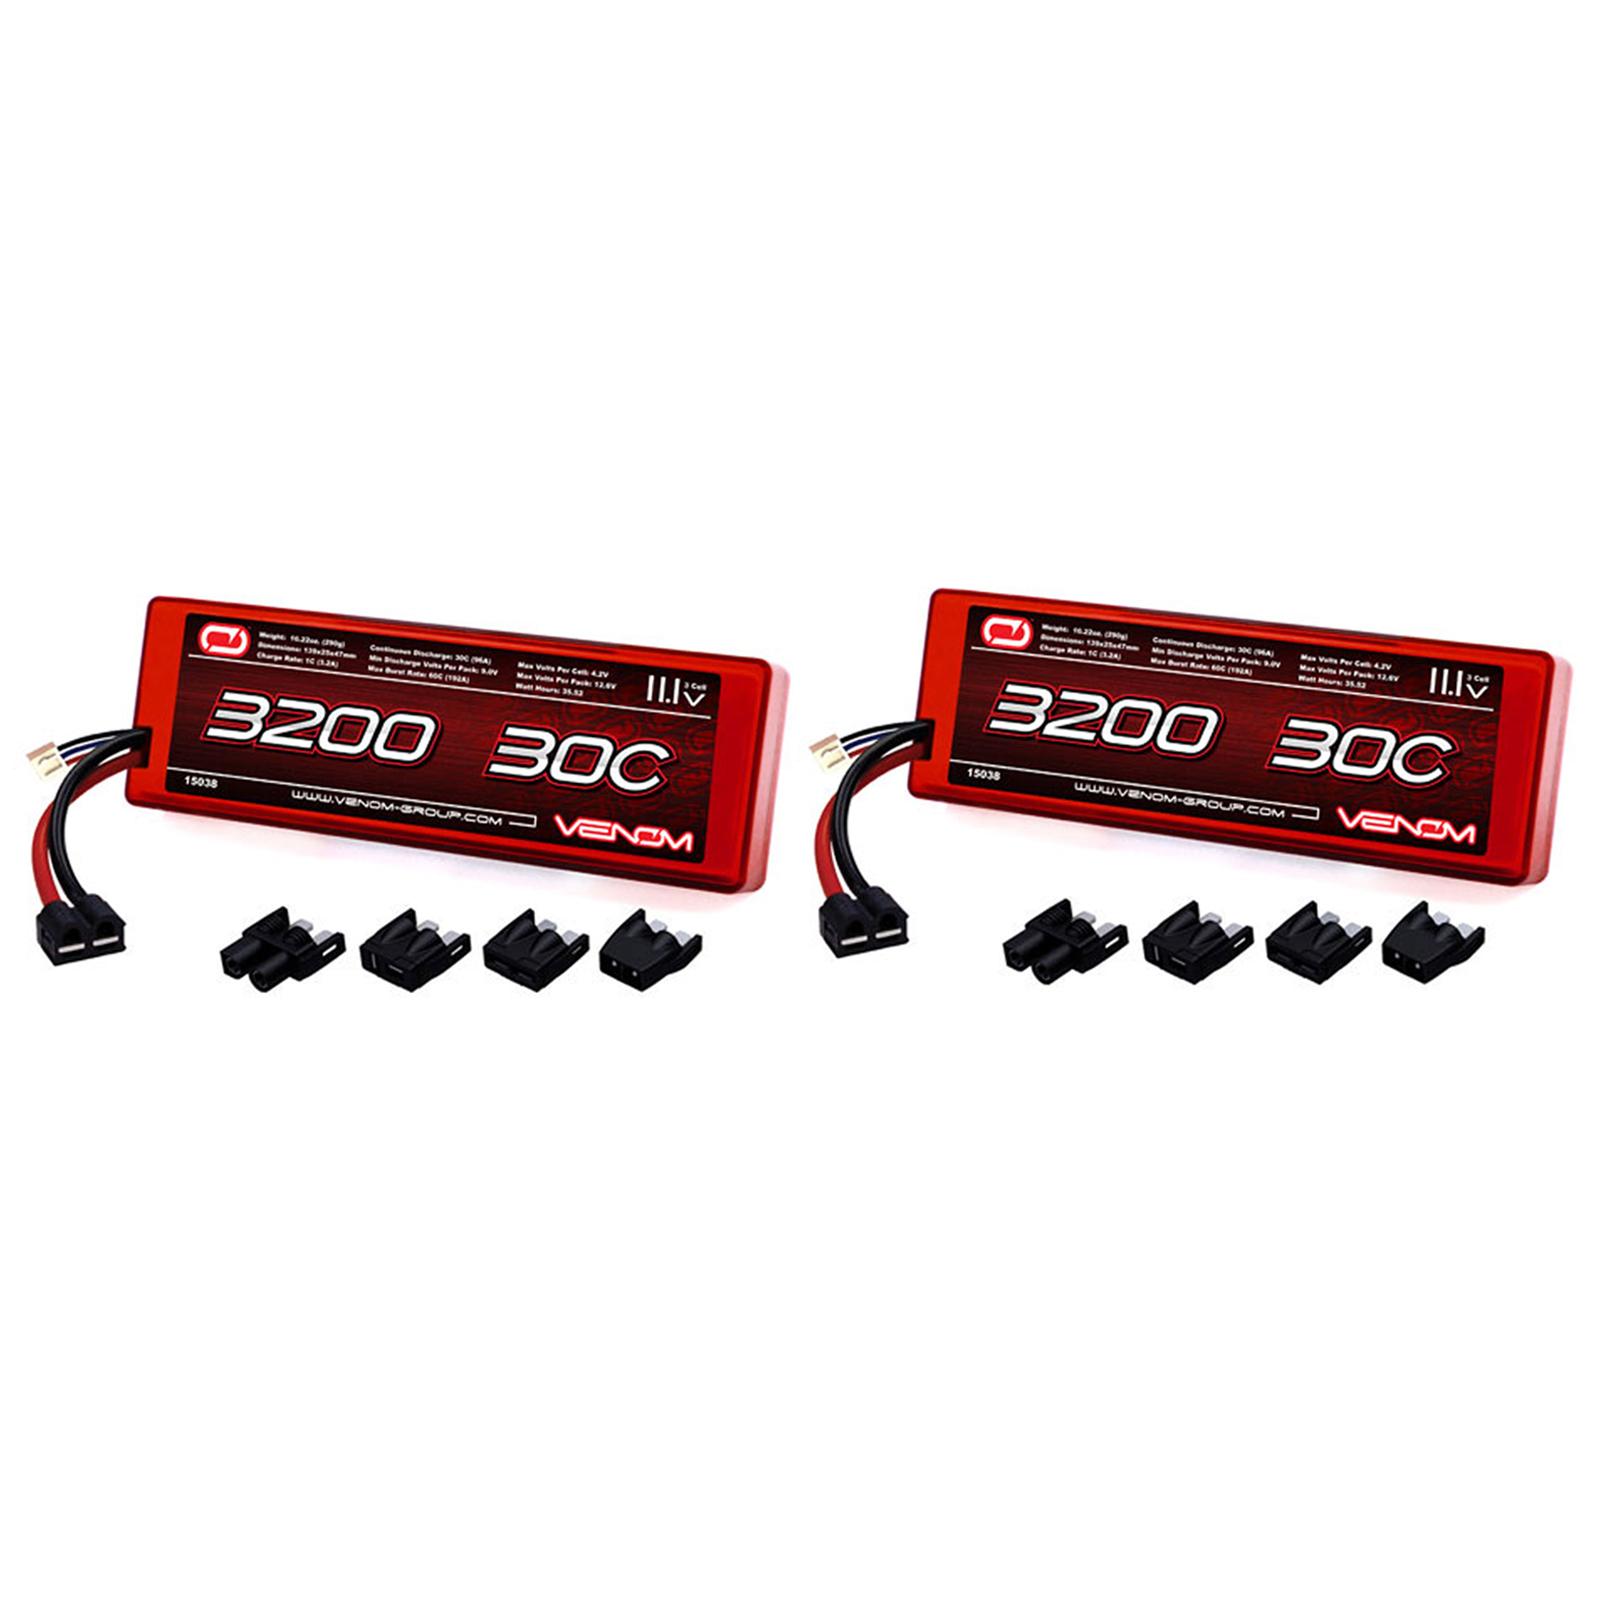 Venom 30C 3S 3200mAh 11.1V Hard Case LiPo Battery ROAR with Universal Plug (EC3 Deans... by Venom